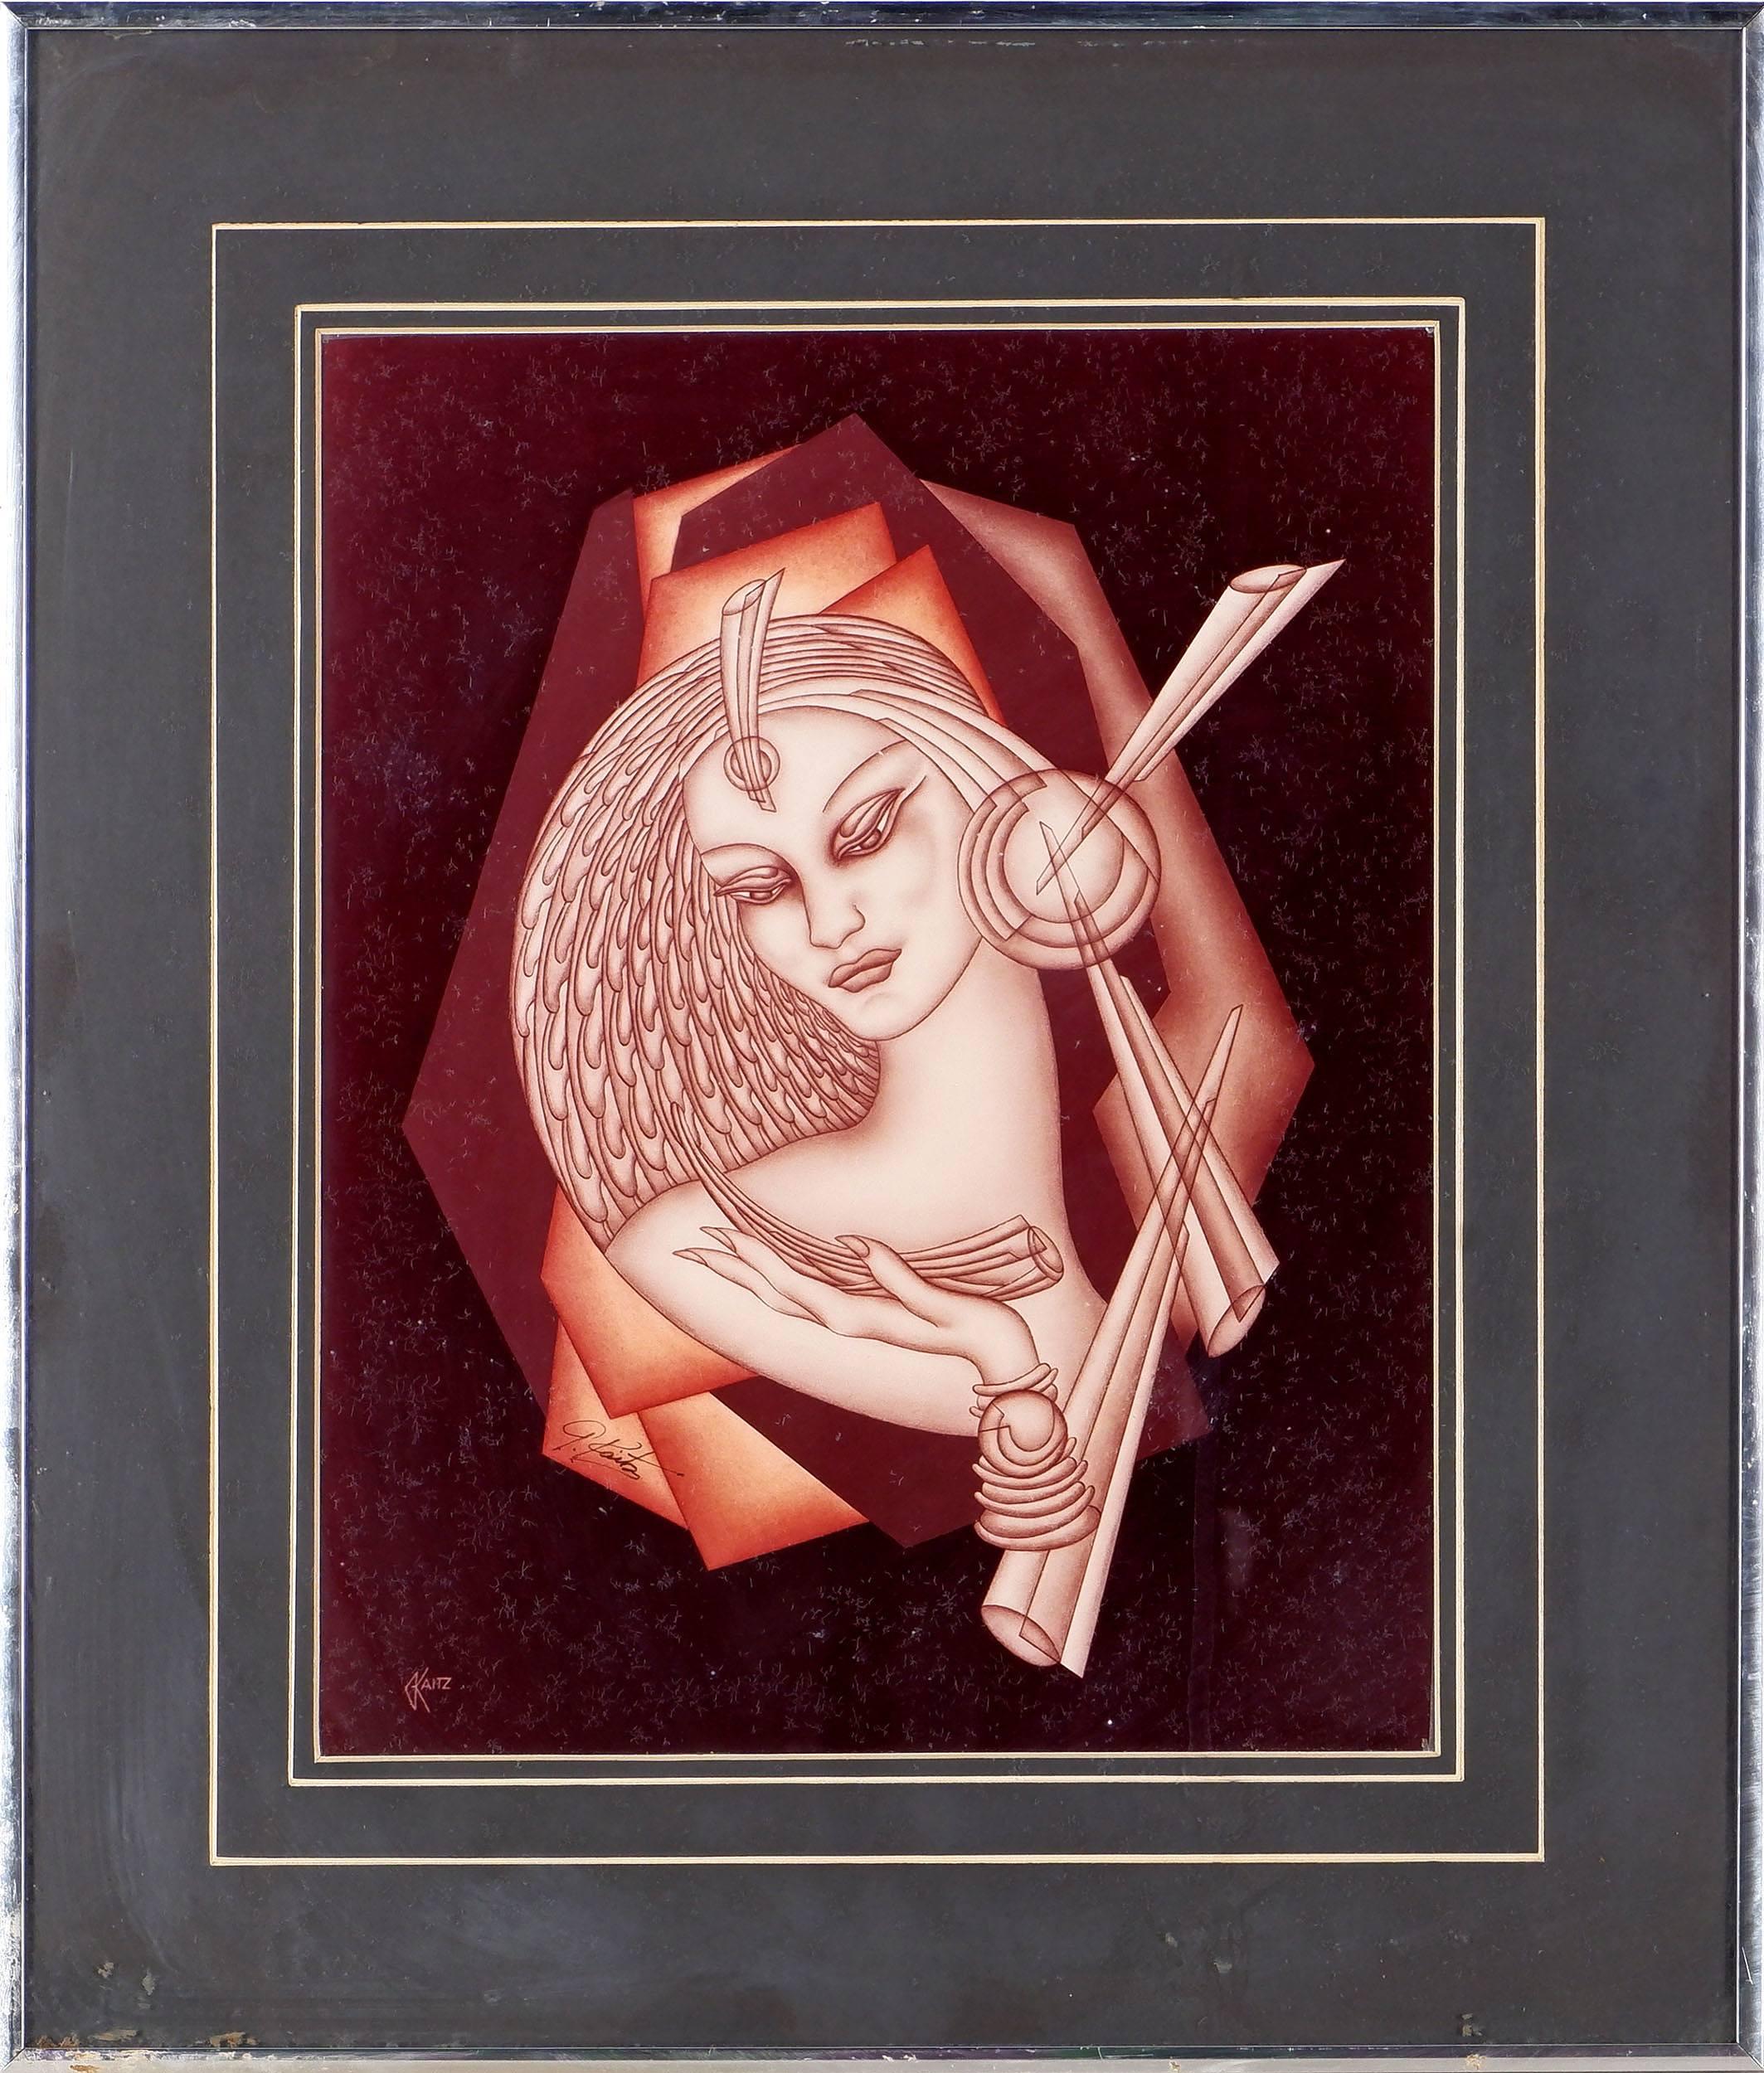 'Gustave Kaitz (American 1913-1992) First Edition Original Decograph'